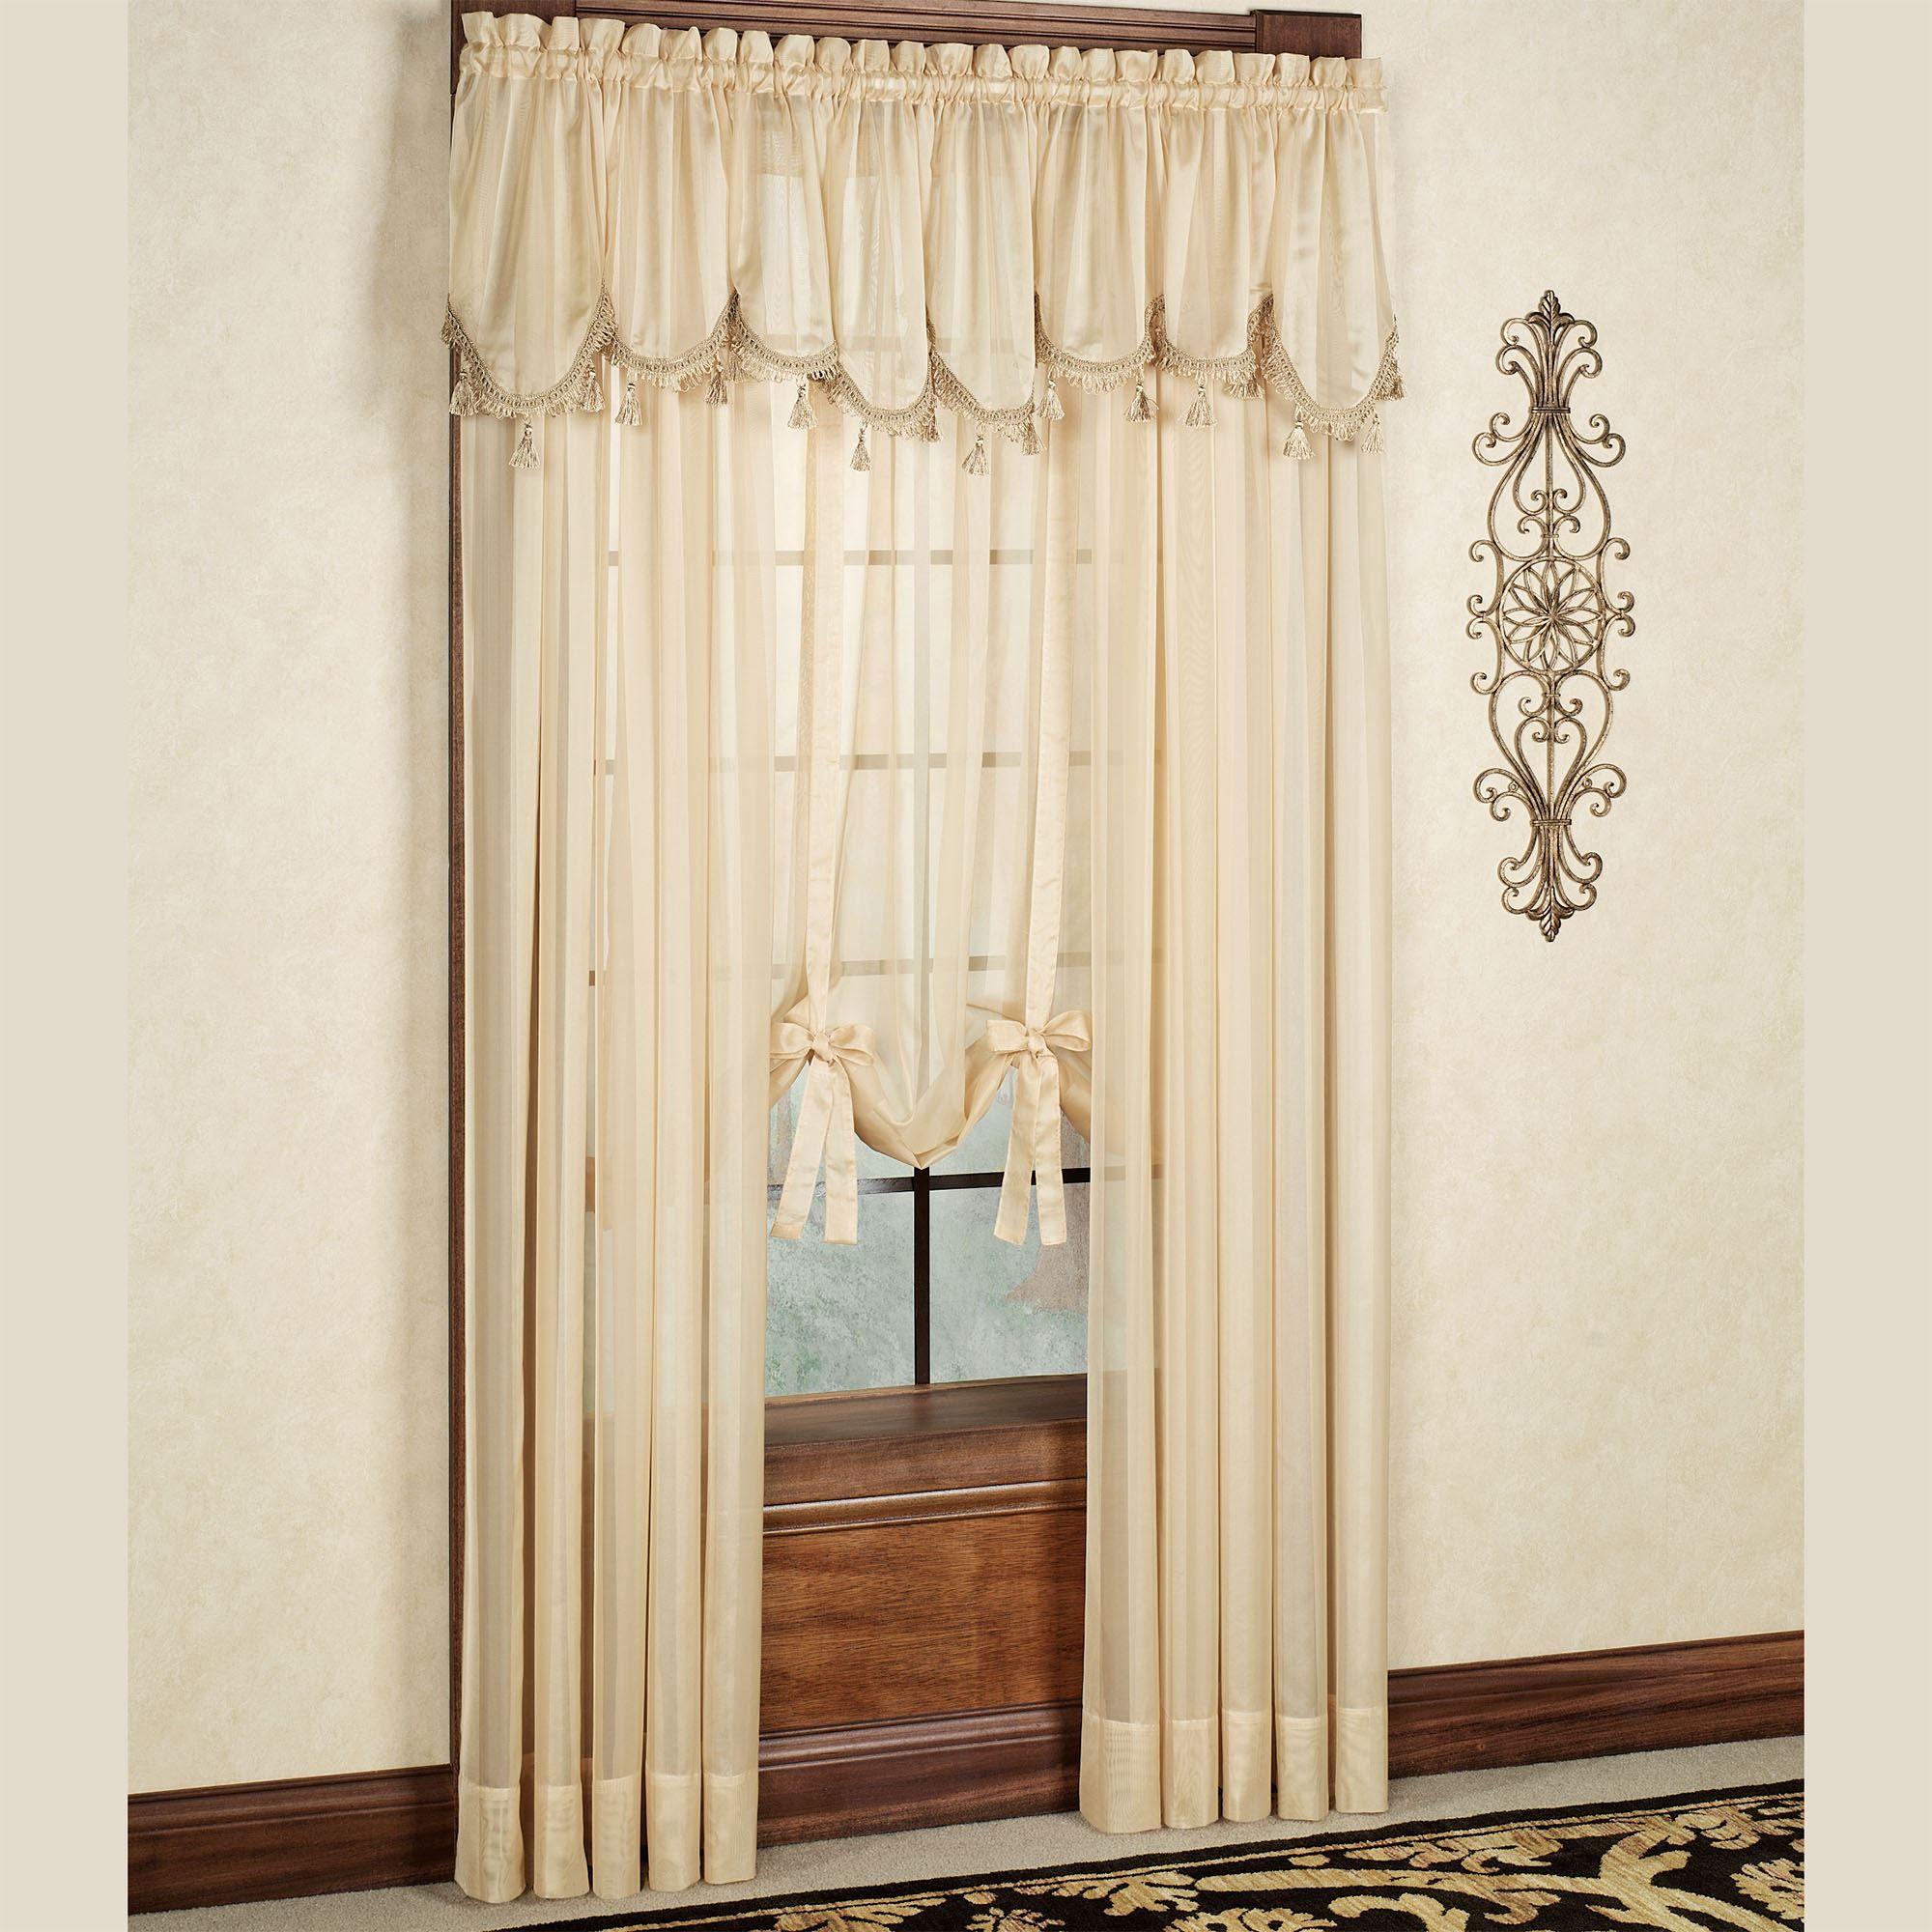 walmart curtains mia x curtain rod window brown inch pair rust com ip